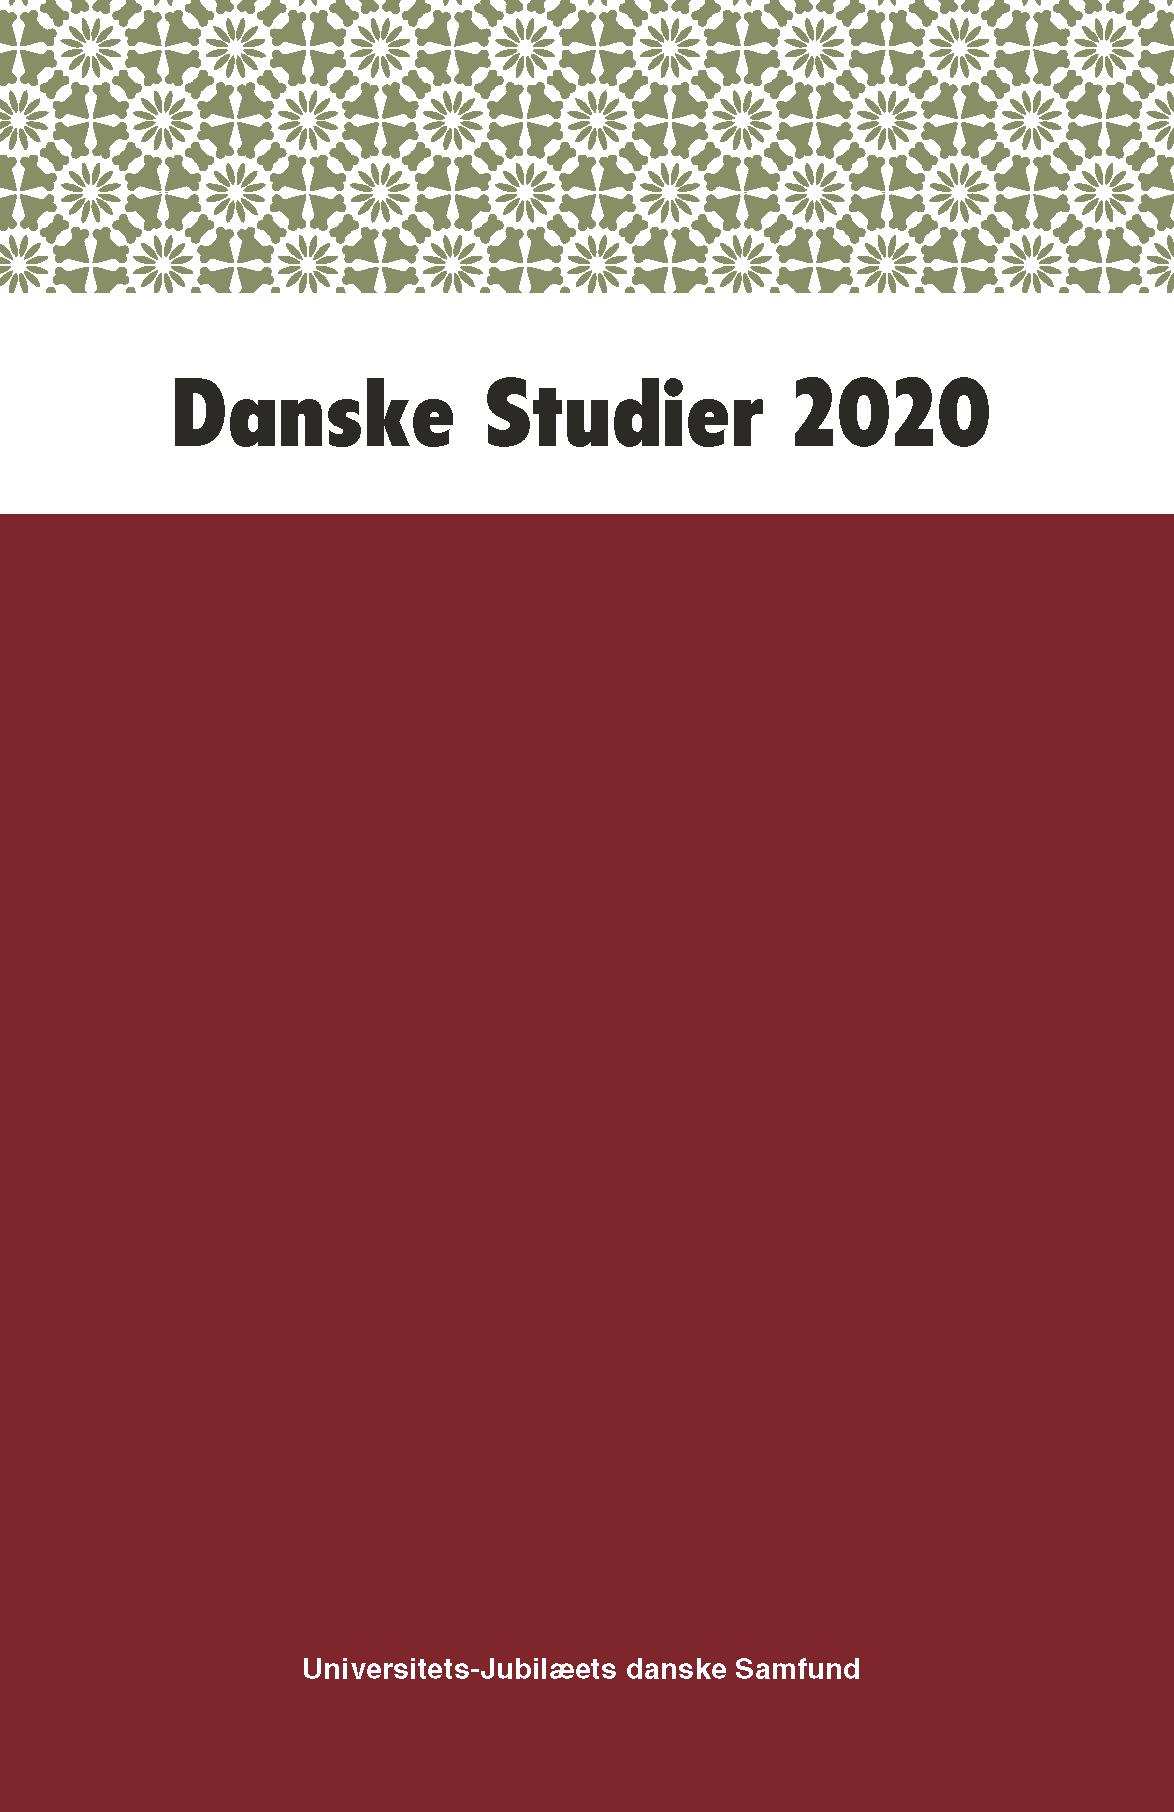 Se 2020: Danske Studier 2020